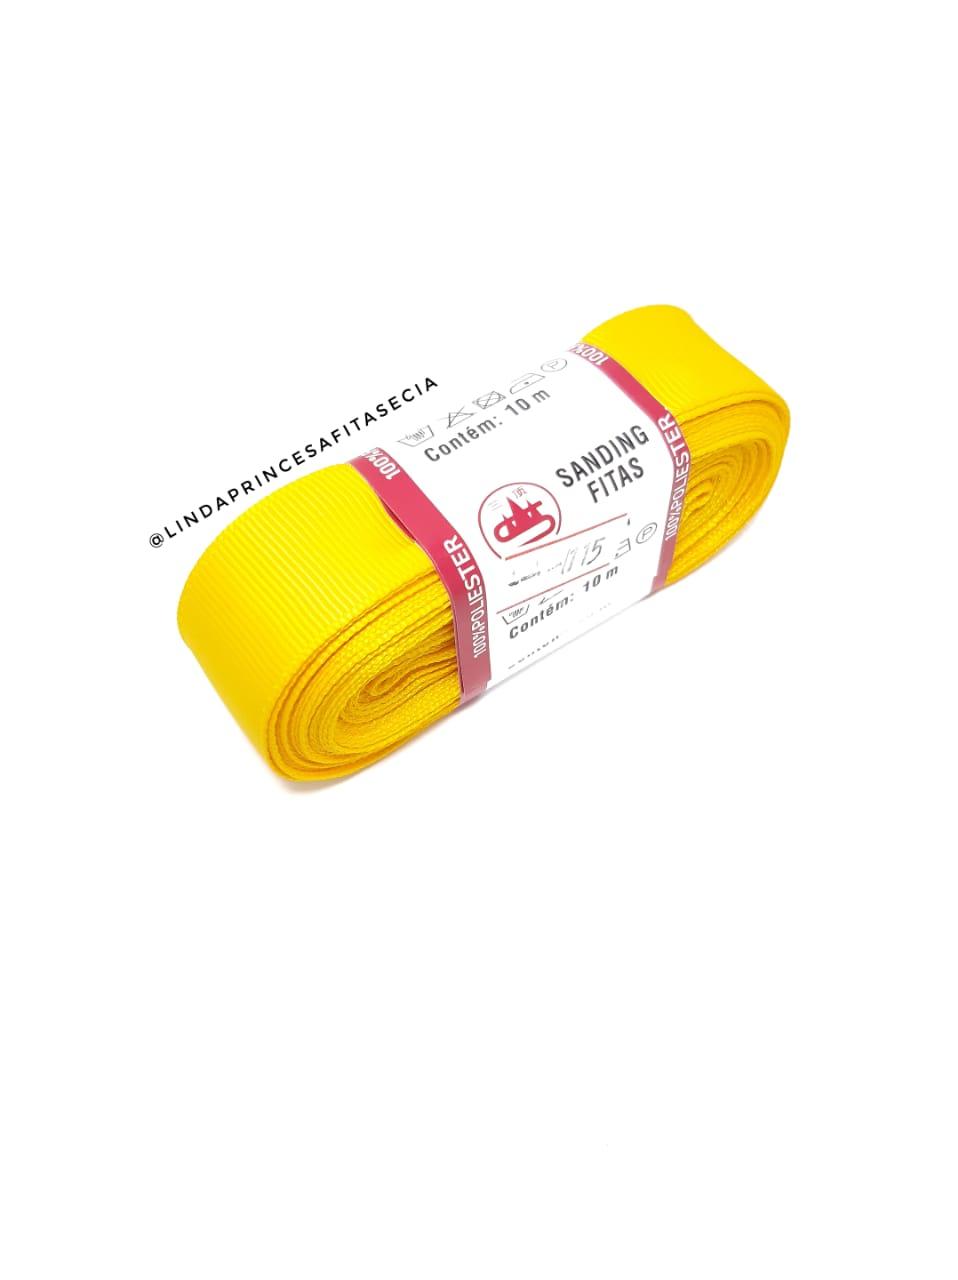 FITA SANDING 22 mm - Cor: 115 Amarelo Sol.